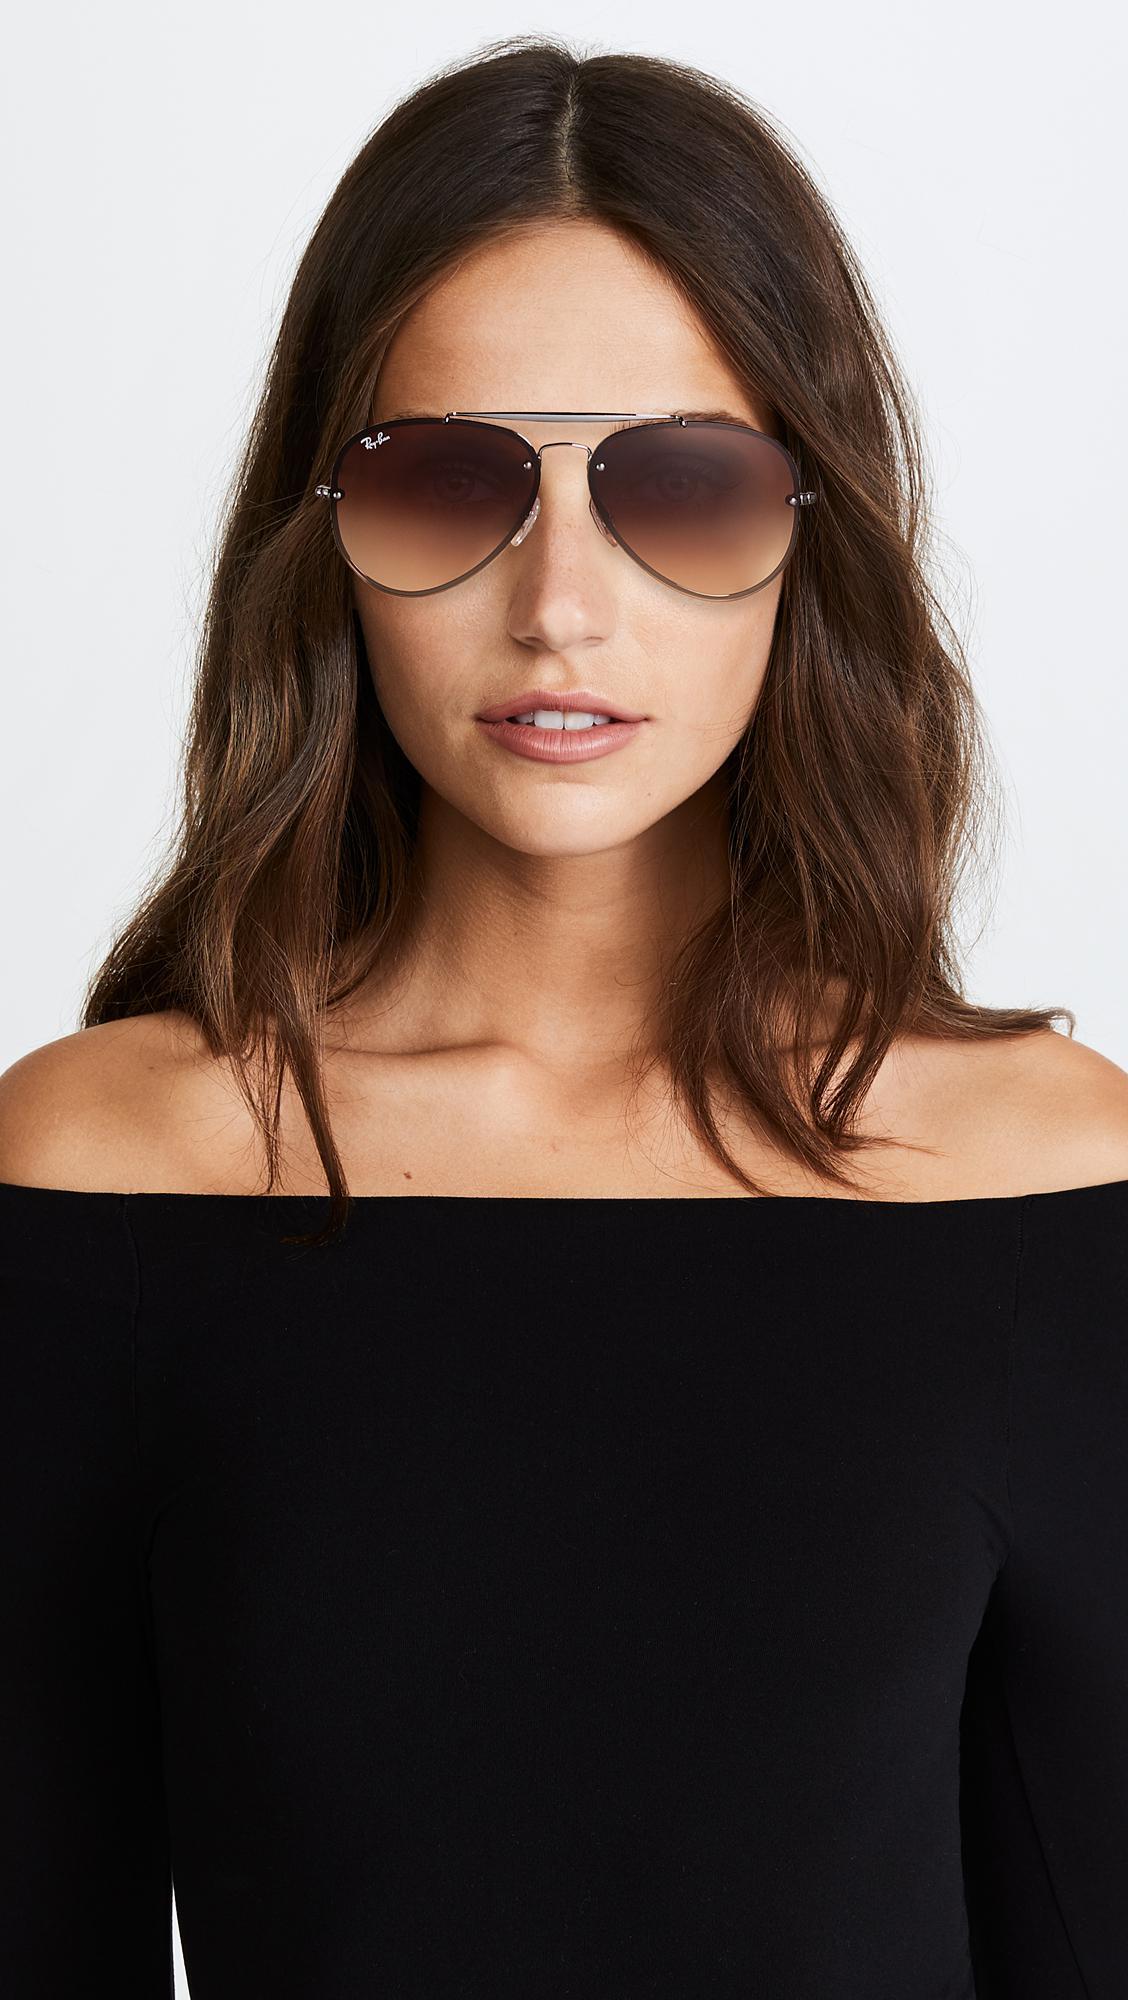 8748f6b60f Ray-Ban Blaze Flat Lens Pilot Aviator Sunglasses in Brown - Lyst